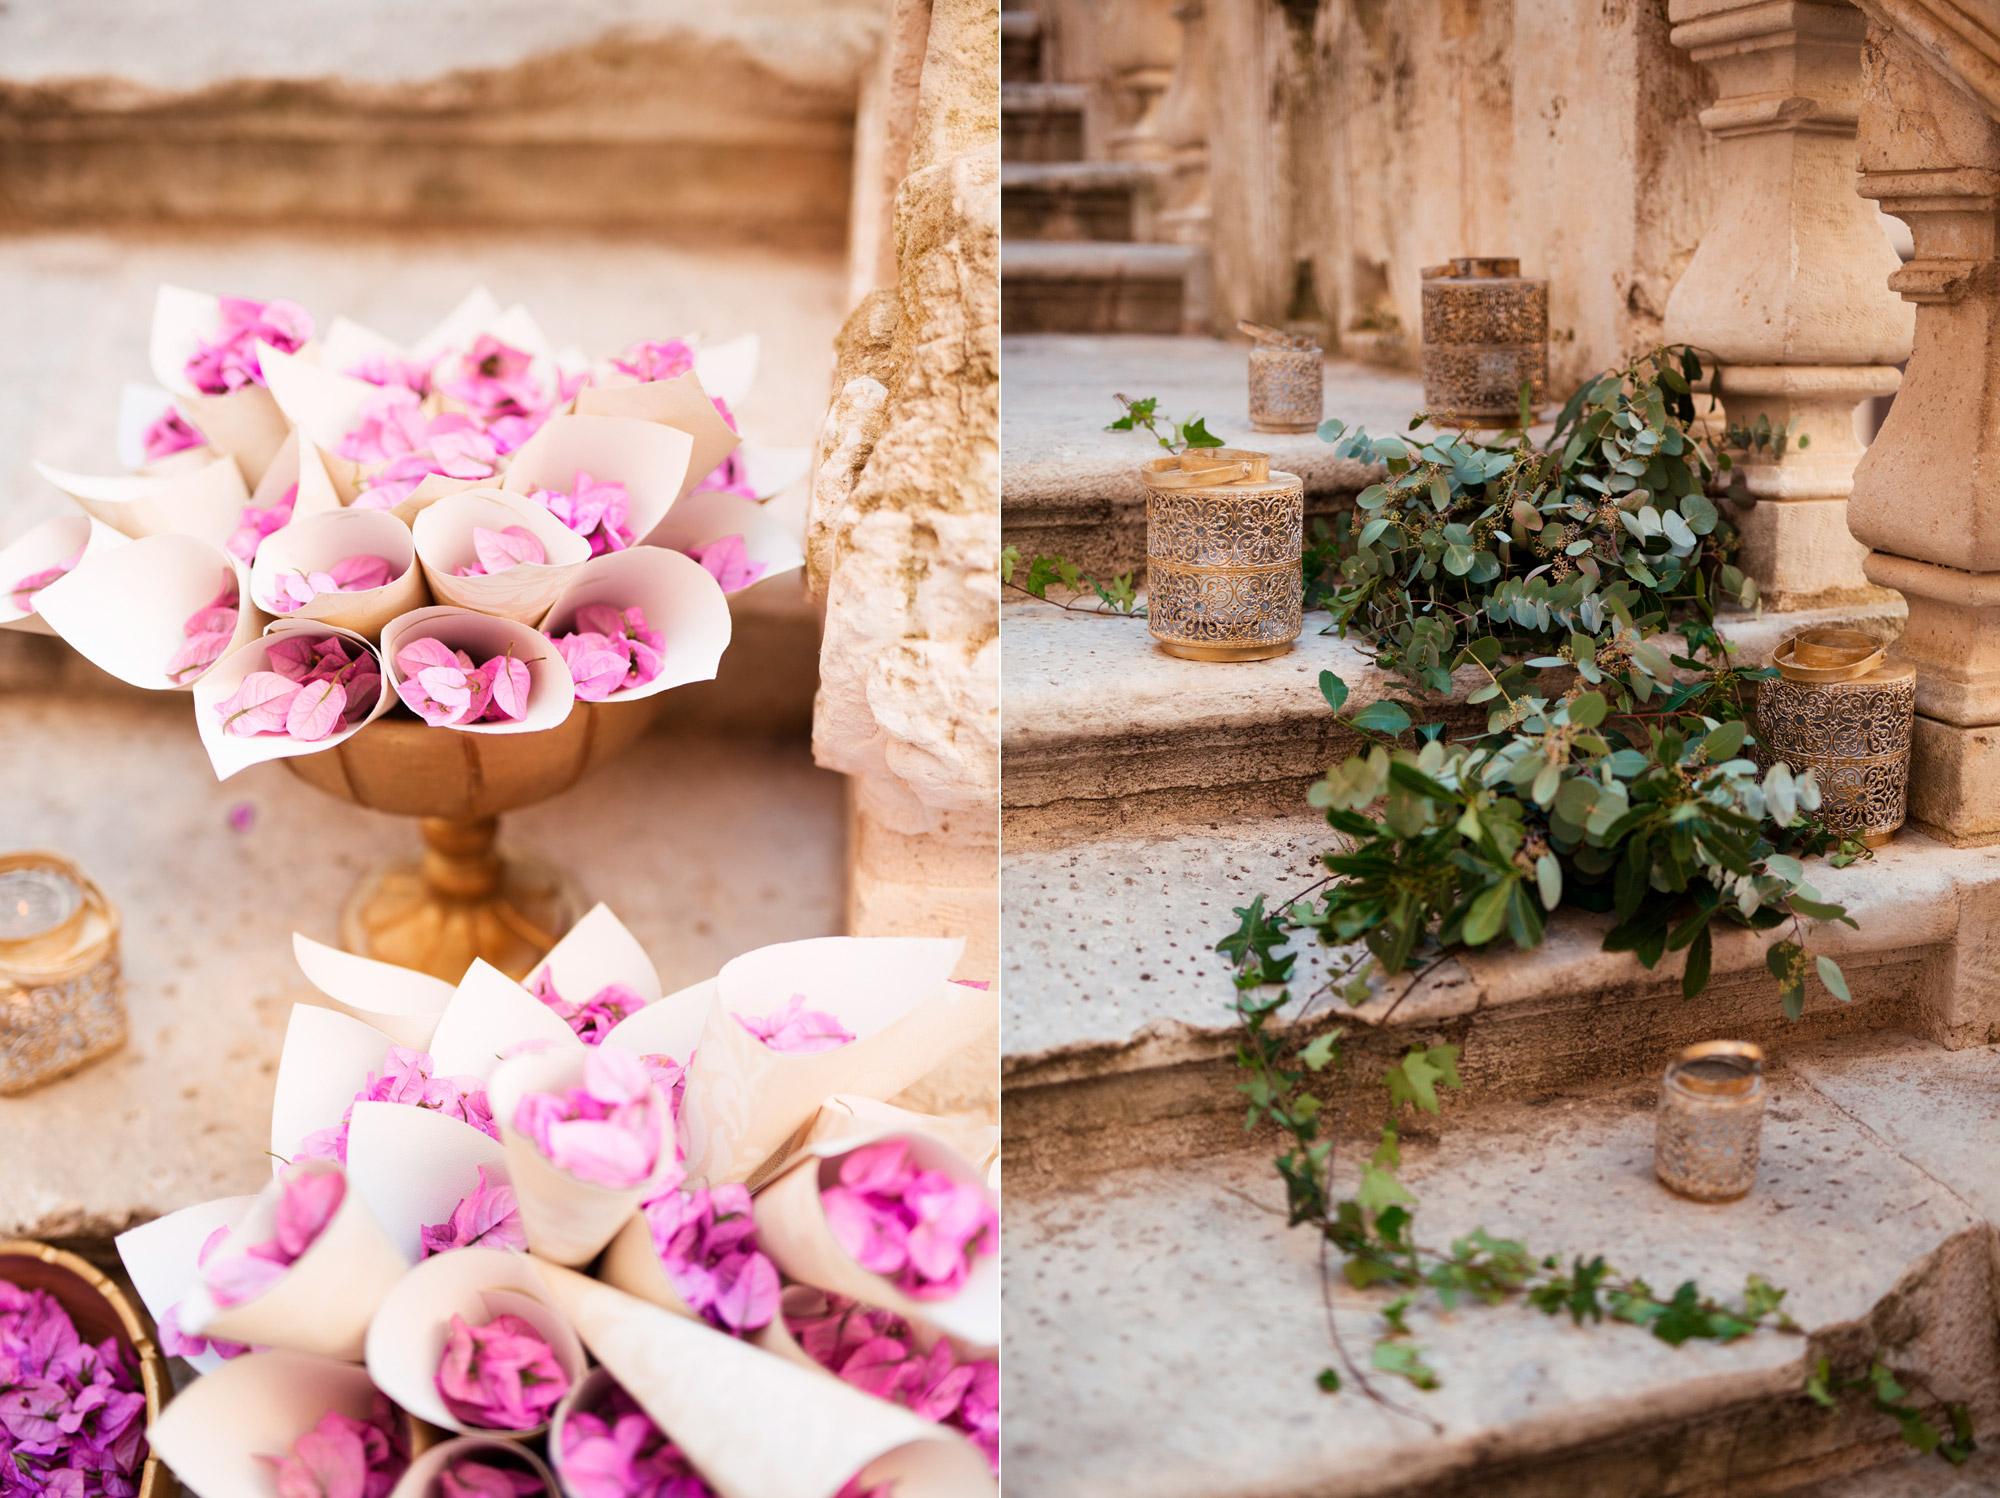 172-FIKUS-PUGLIA-wedding-ostuni-masseria.jpg